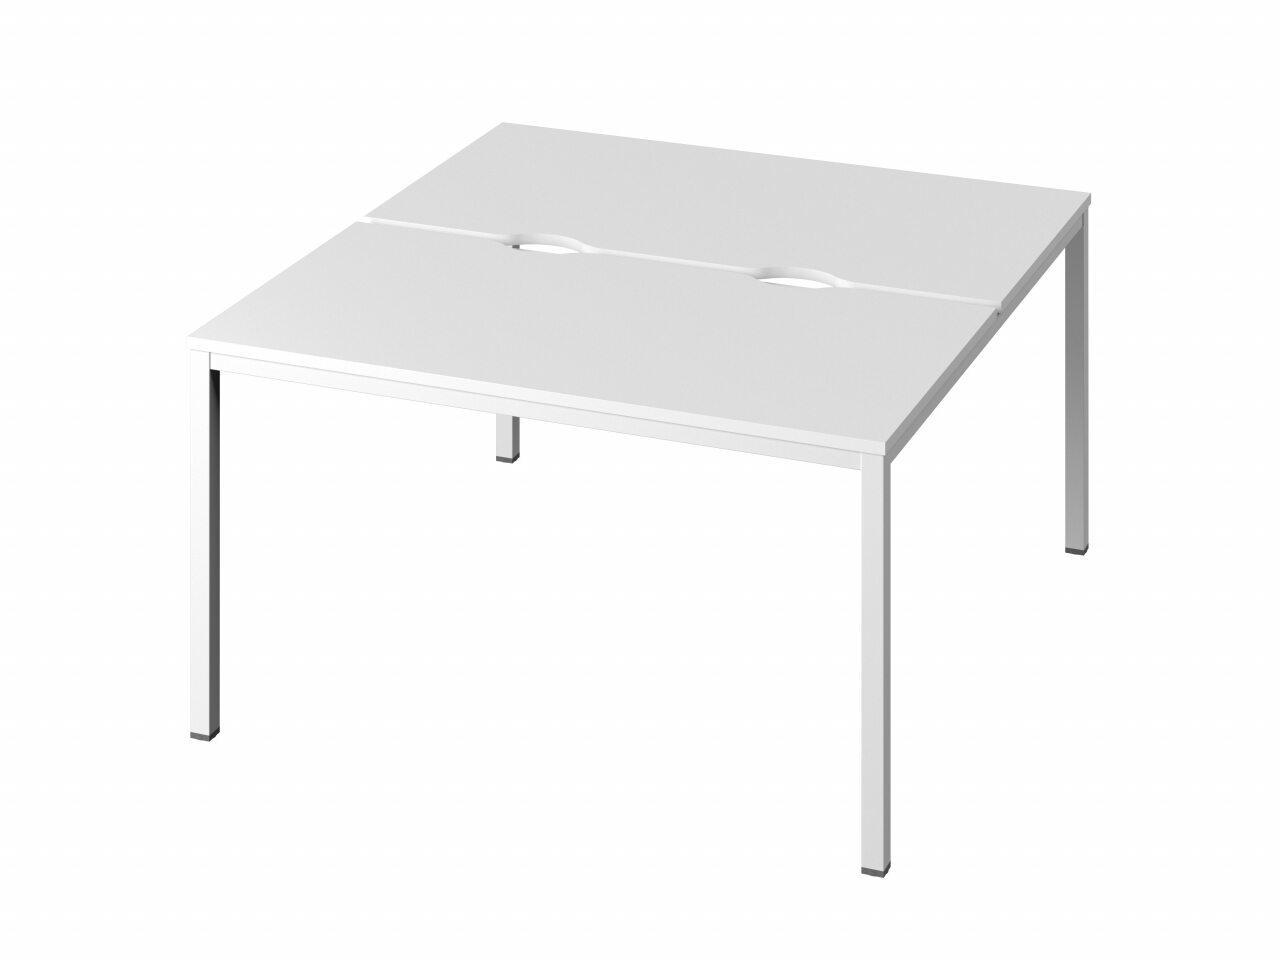 Стол-тандем на металлокаркасе  Public Comfort 135x144x74 - фото 1